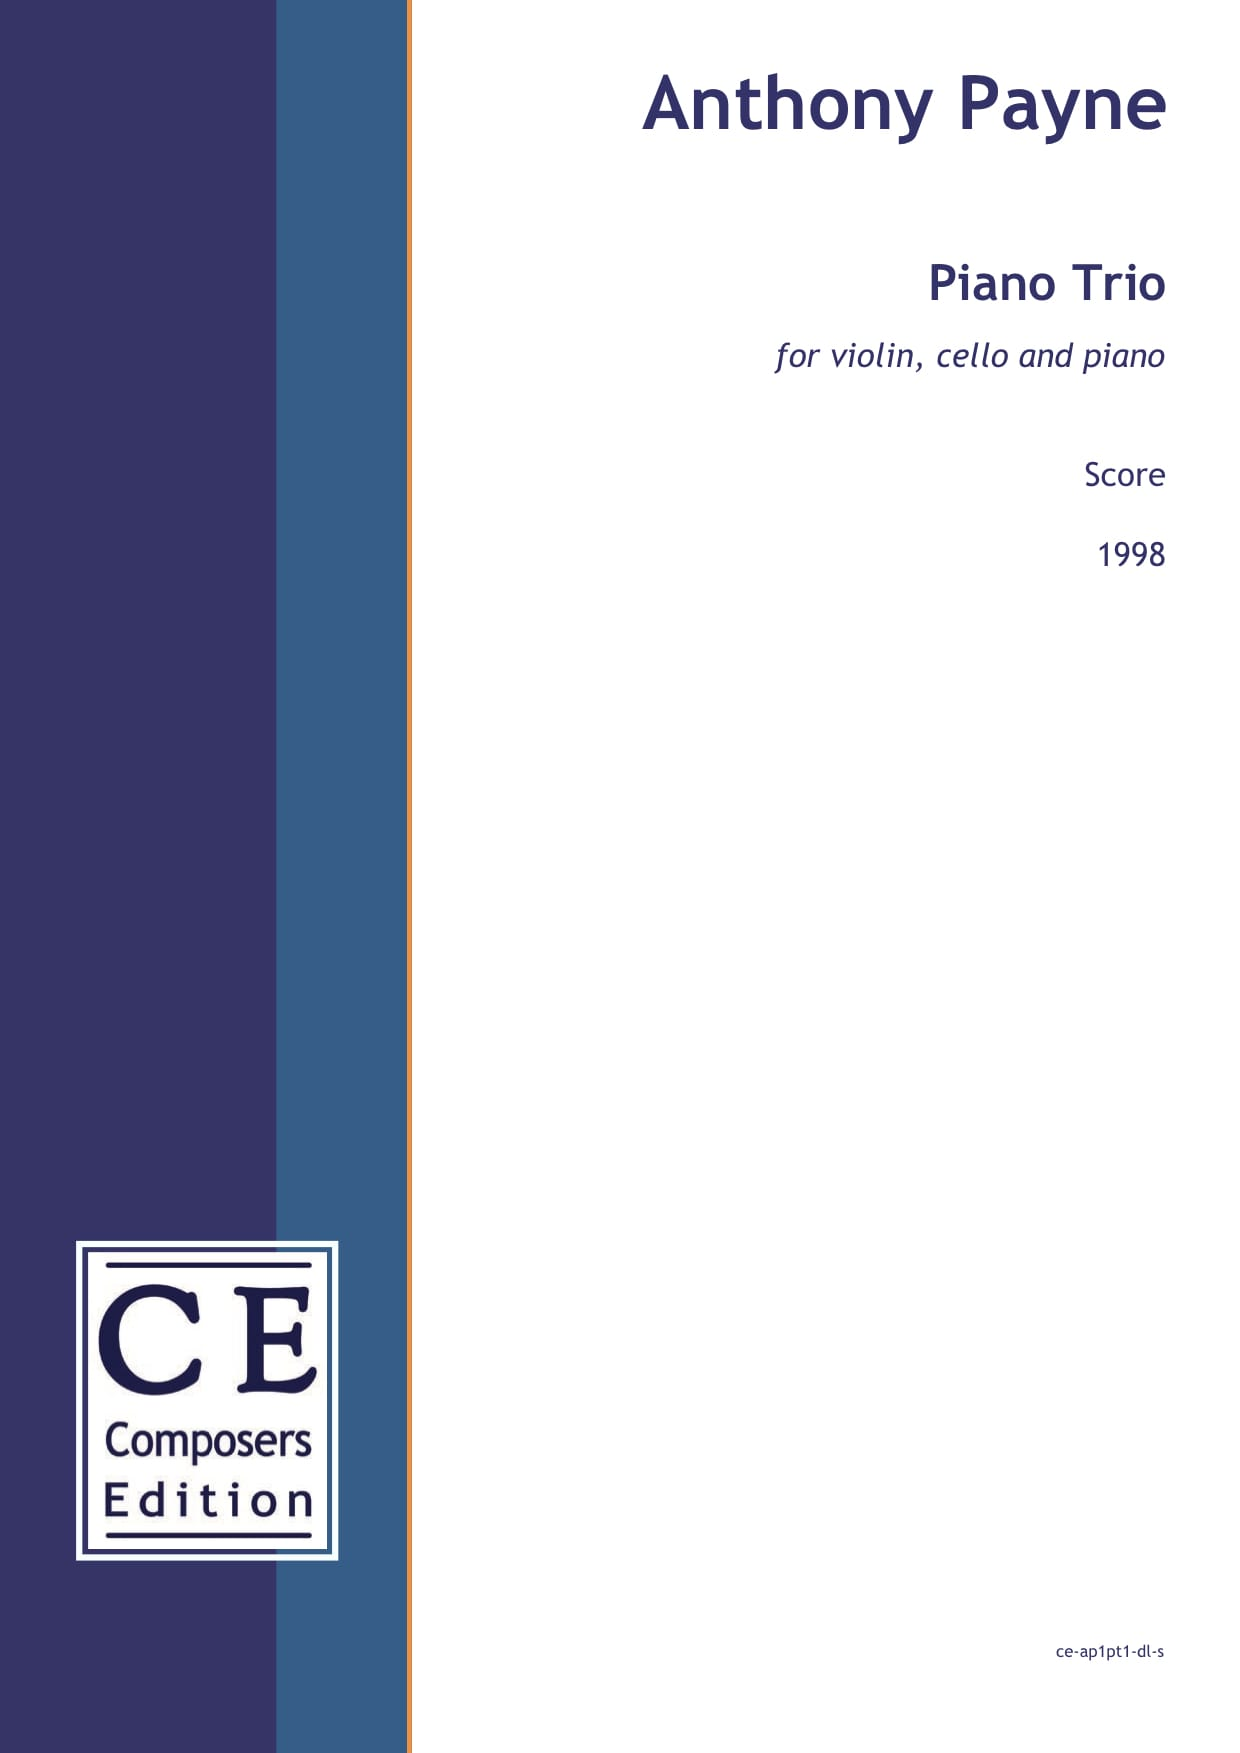 Anthony Payne: Piano Trio for violin, cello and piano